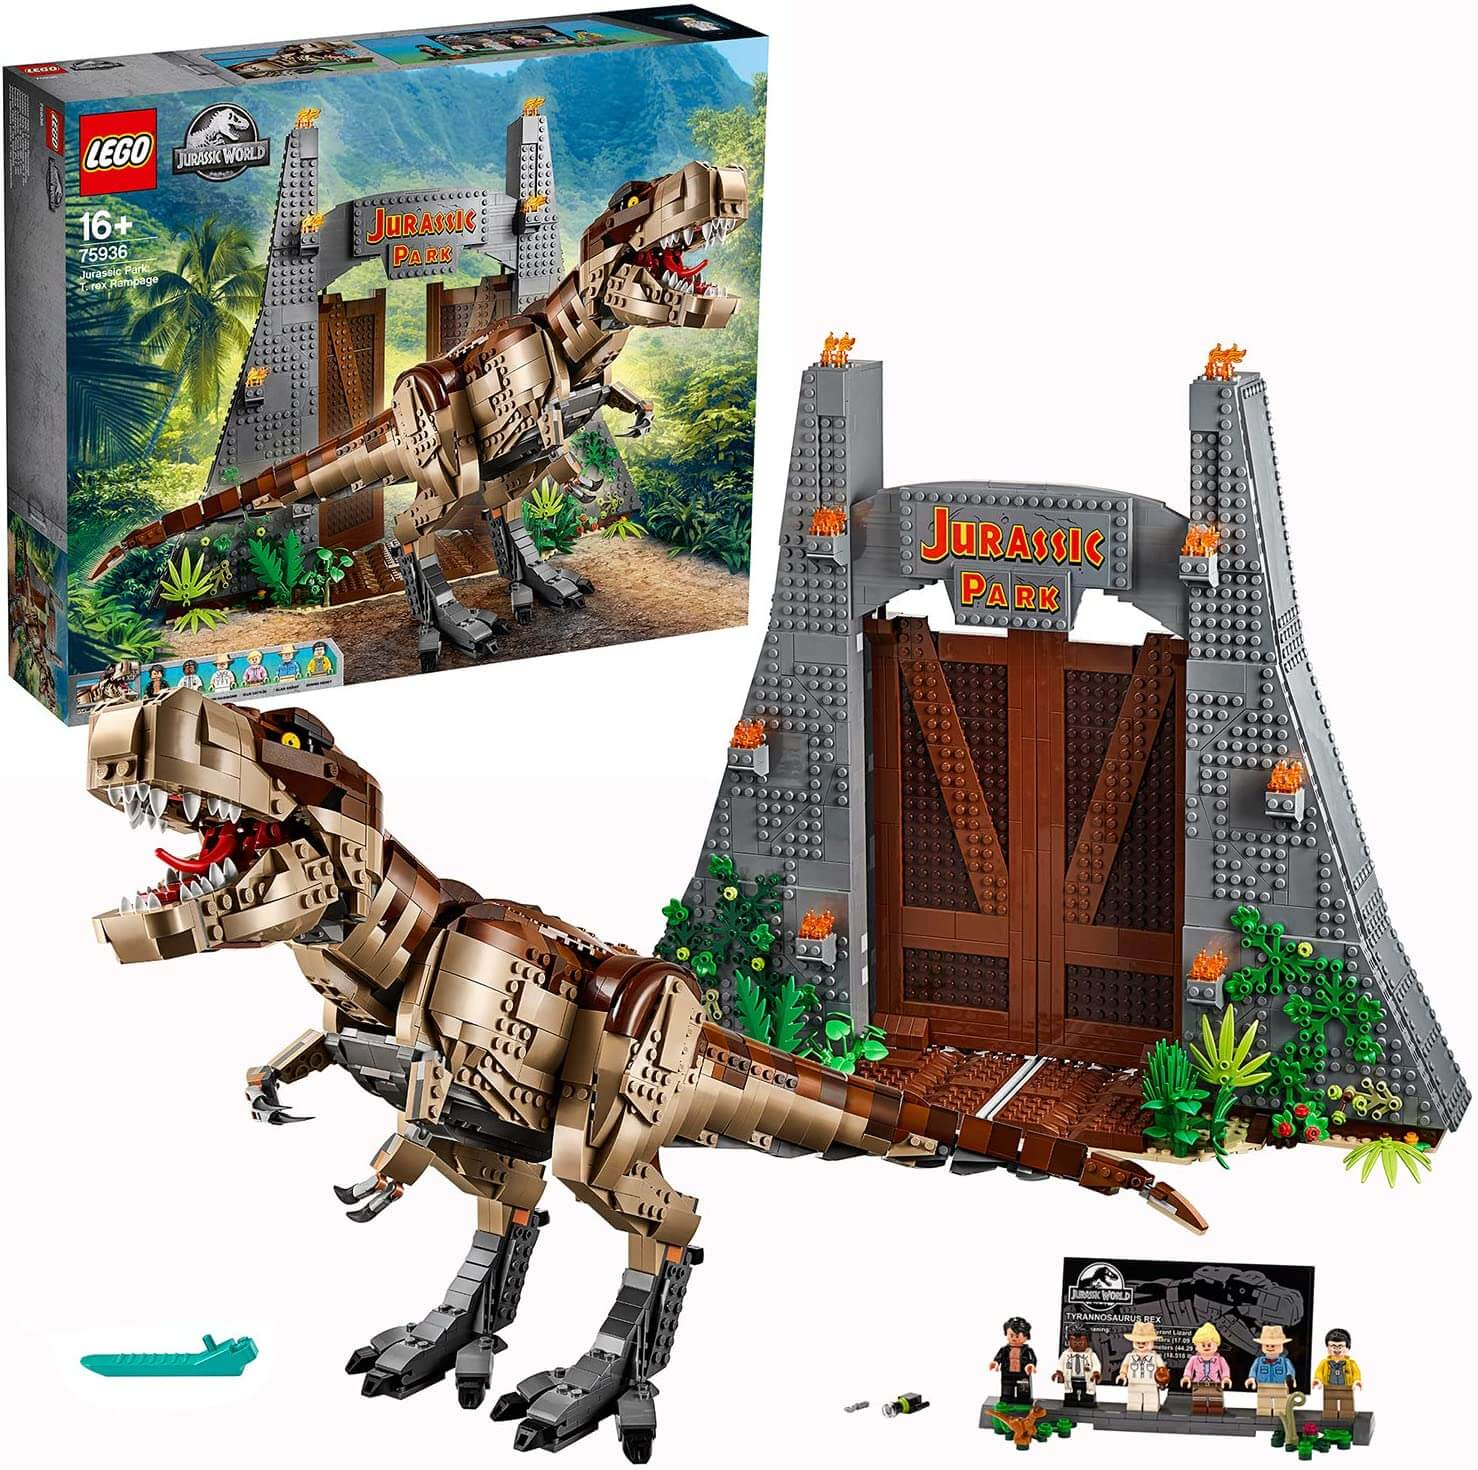 LEGO ジュラシック・パーク T-レックスが大暴れ 75936 を高額買取